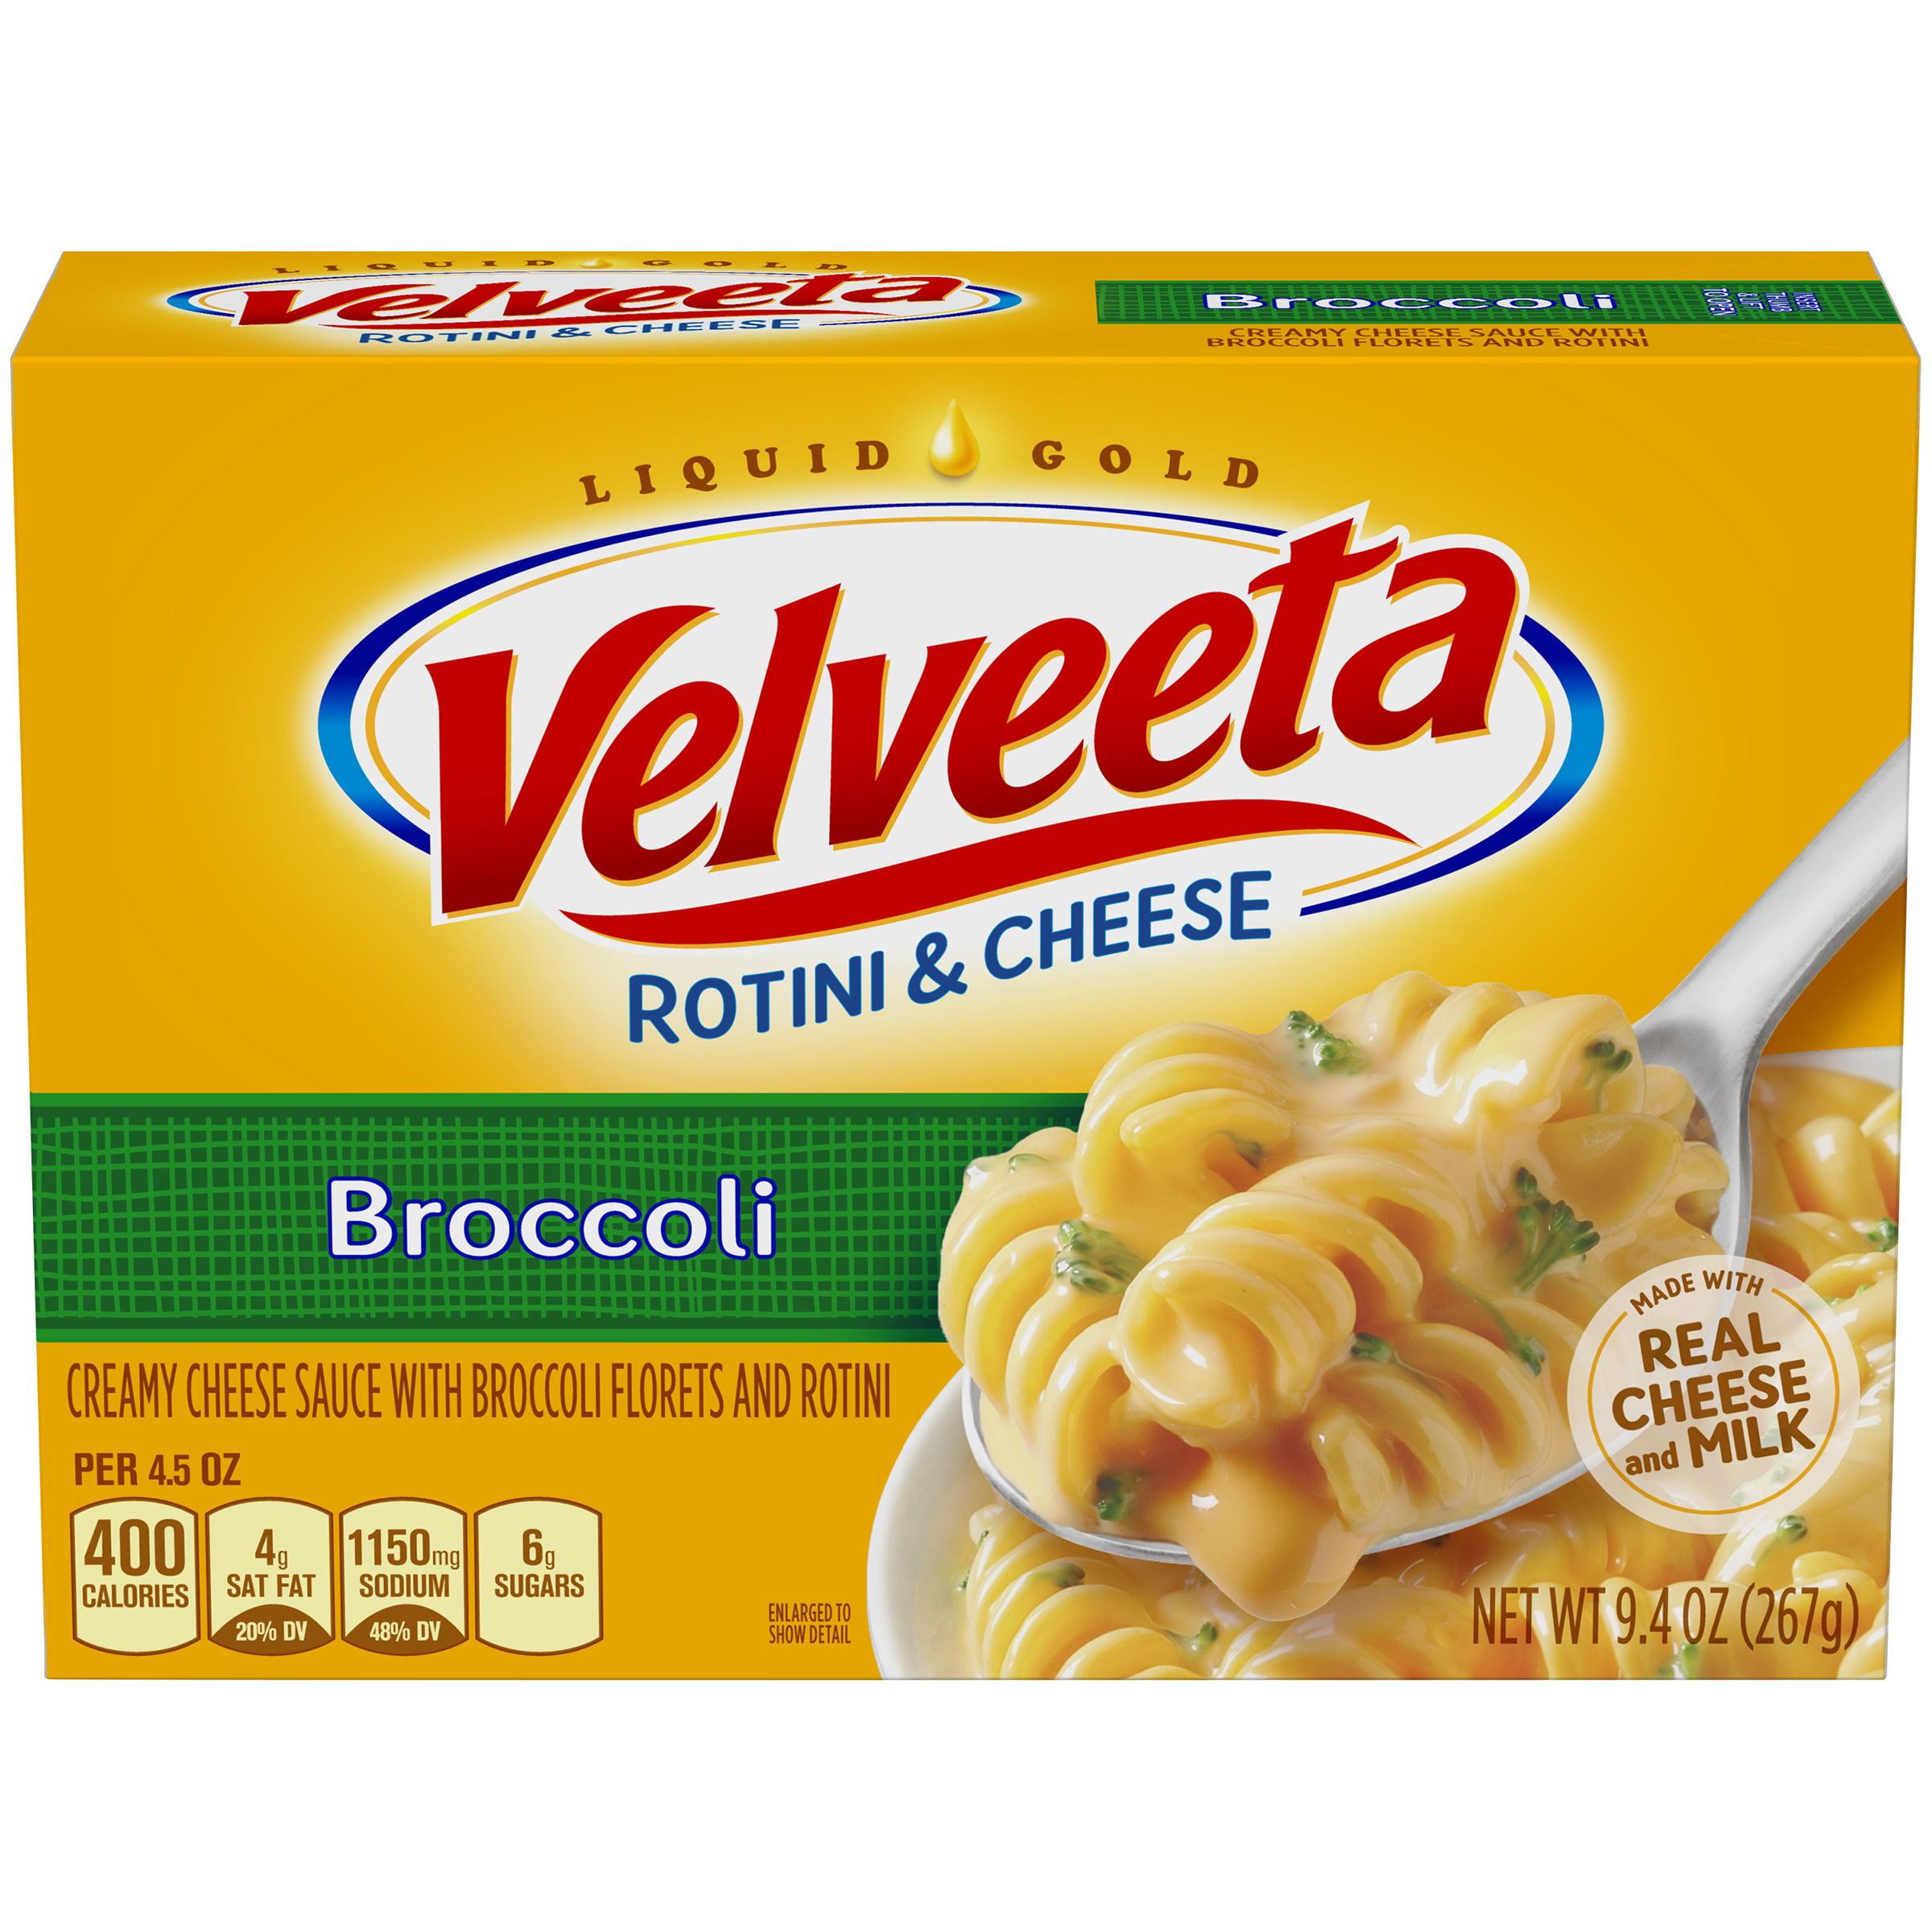 Velveeta Broccoli Rotini & Cheese 9.4 oz. Box